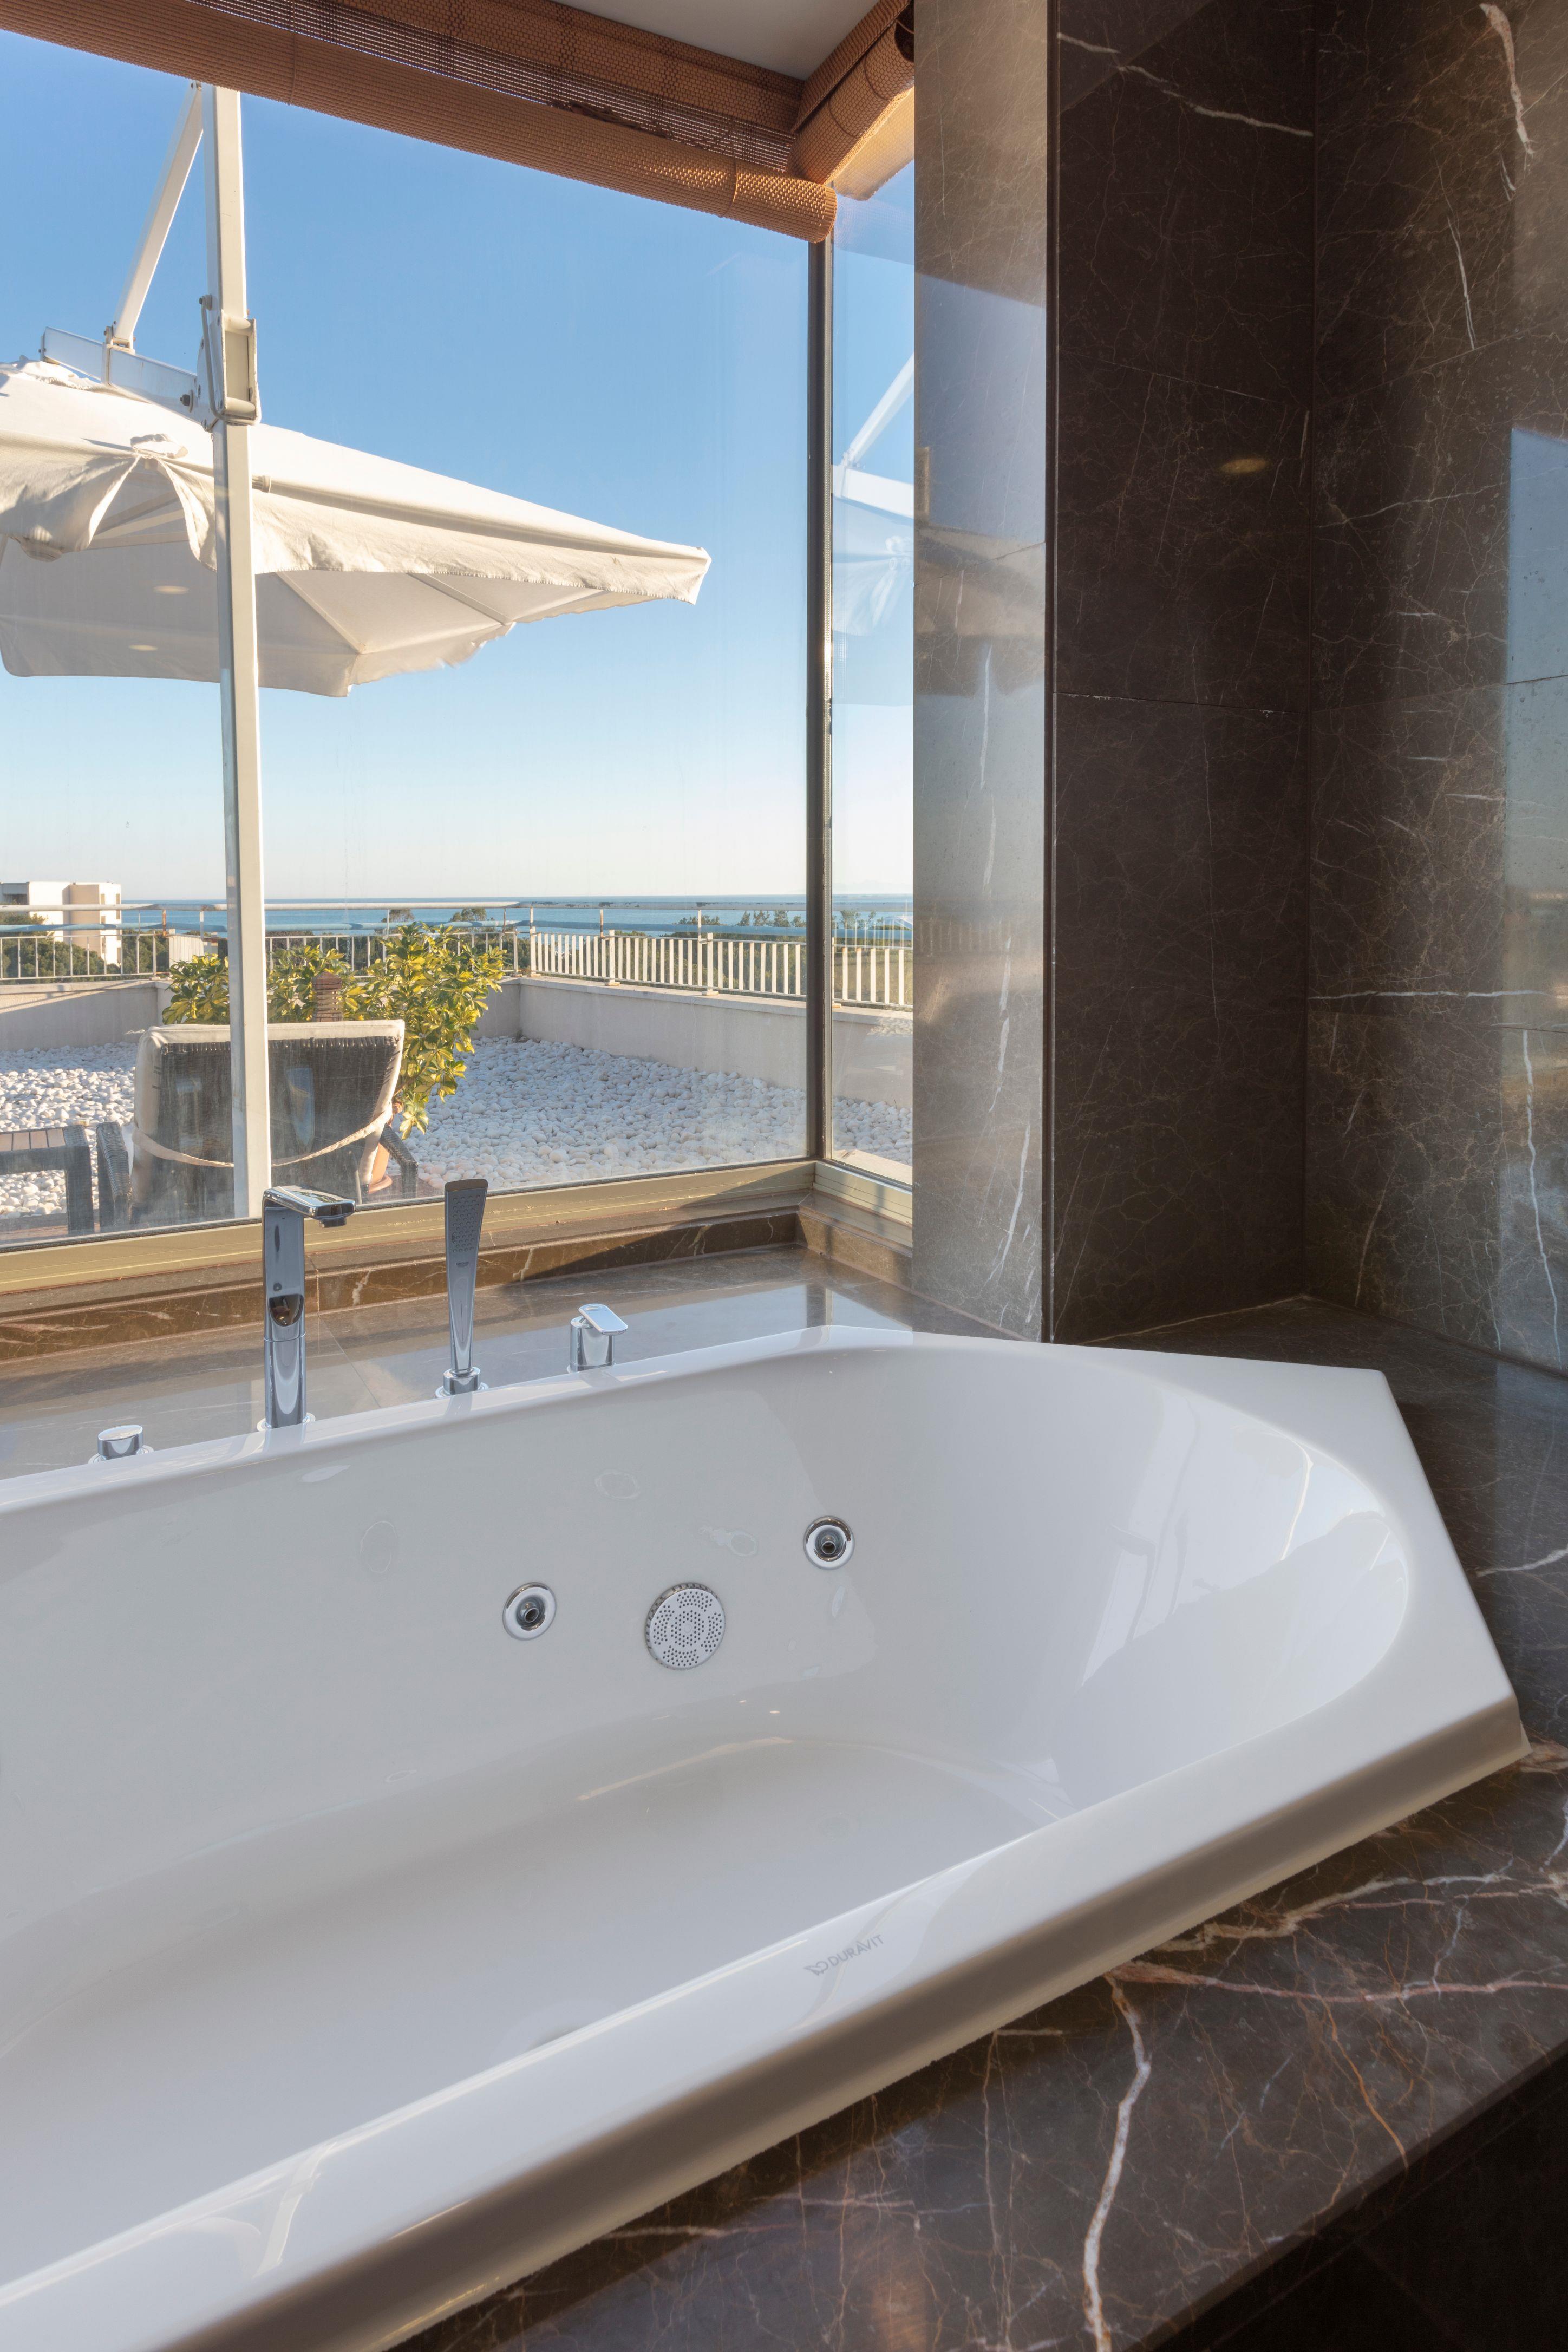 http://www.orextravel.sk/OREX/hotelphotos/zeynep-hotel-general-0013.jpg